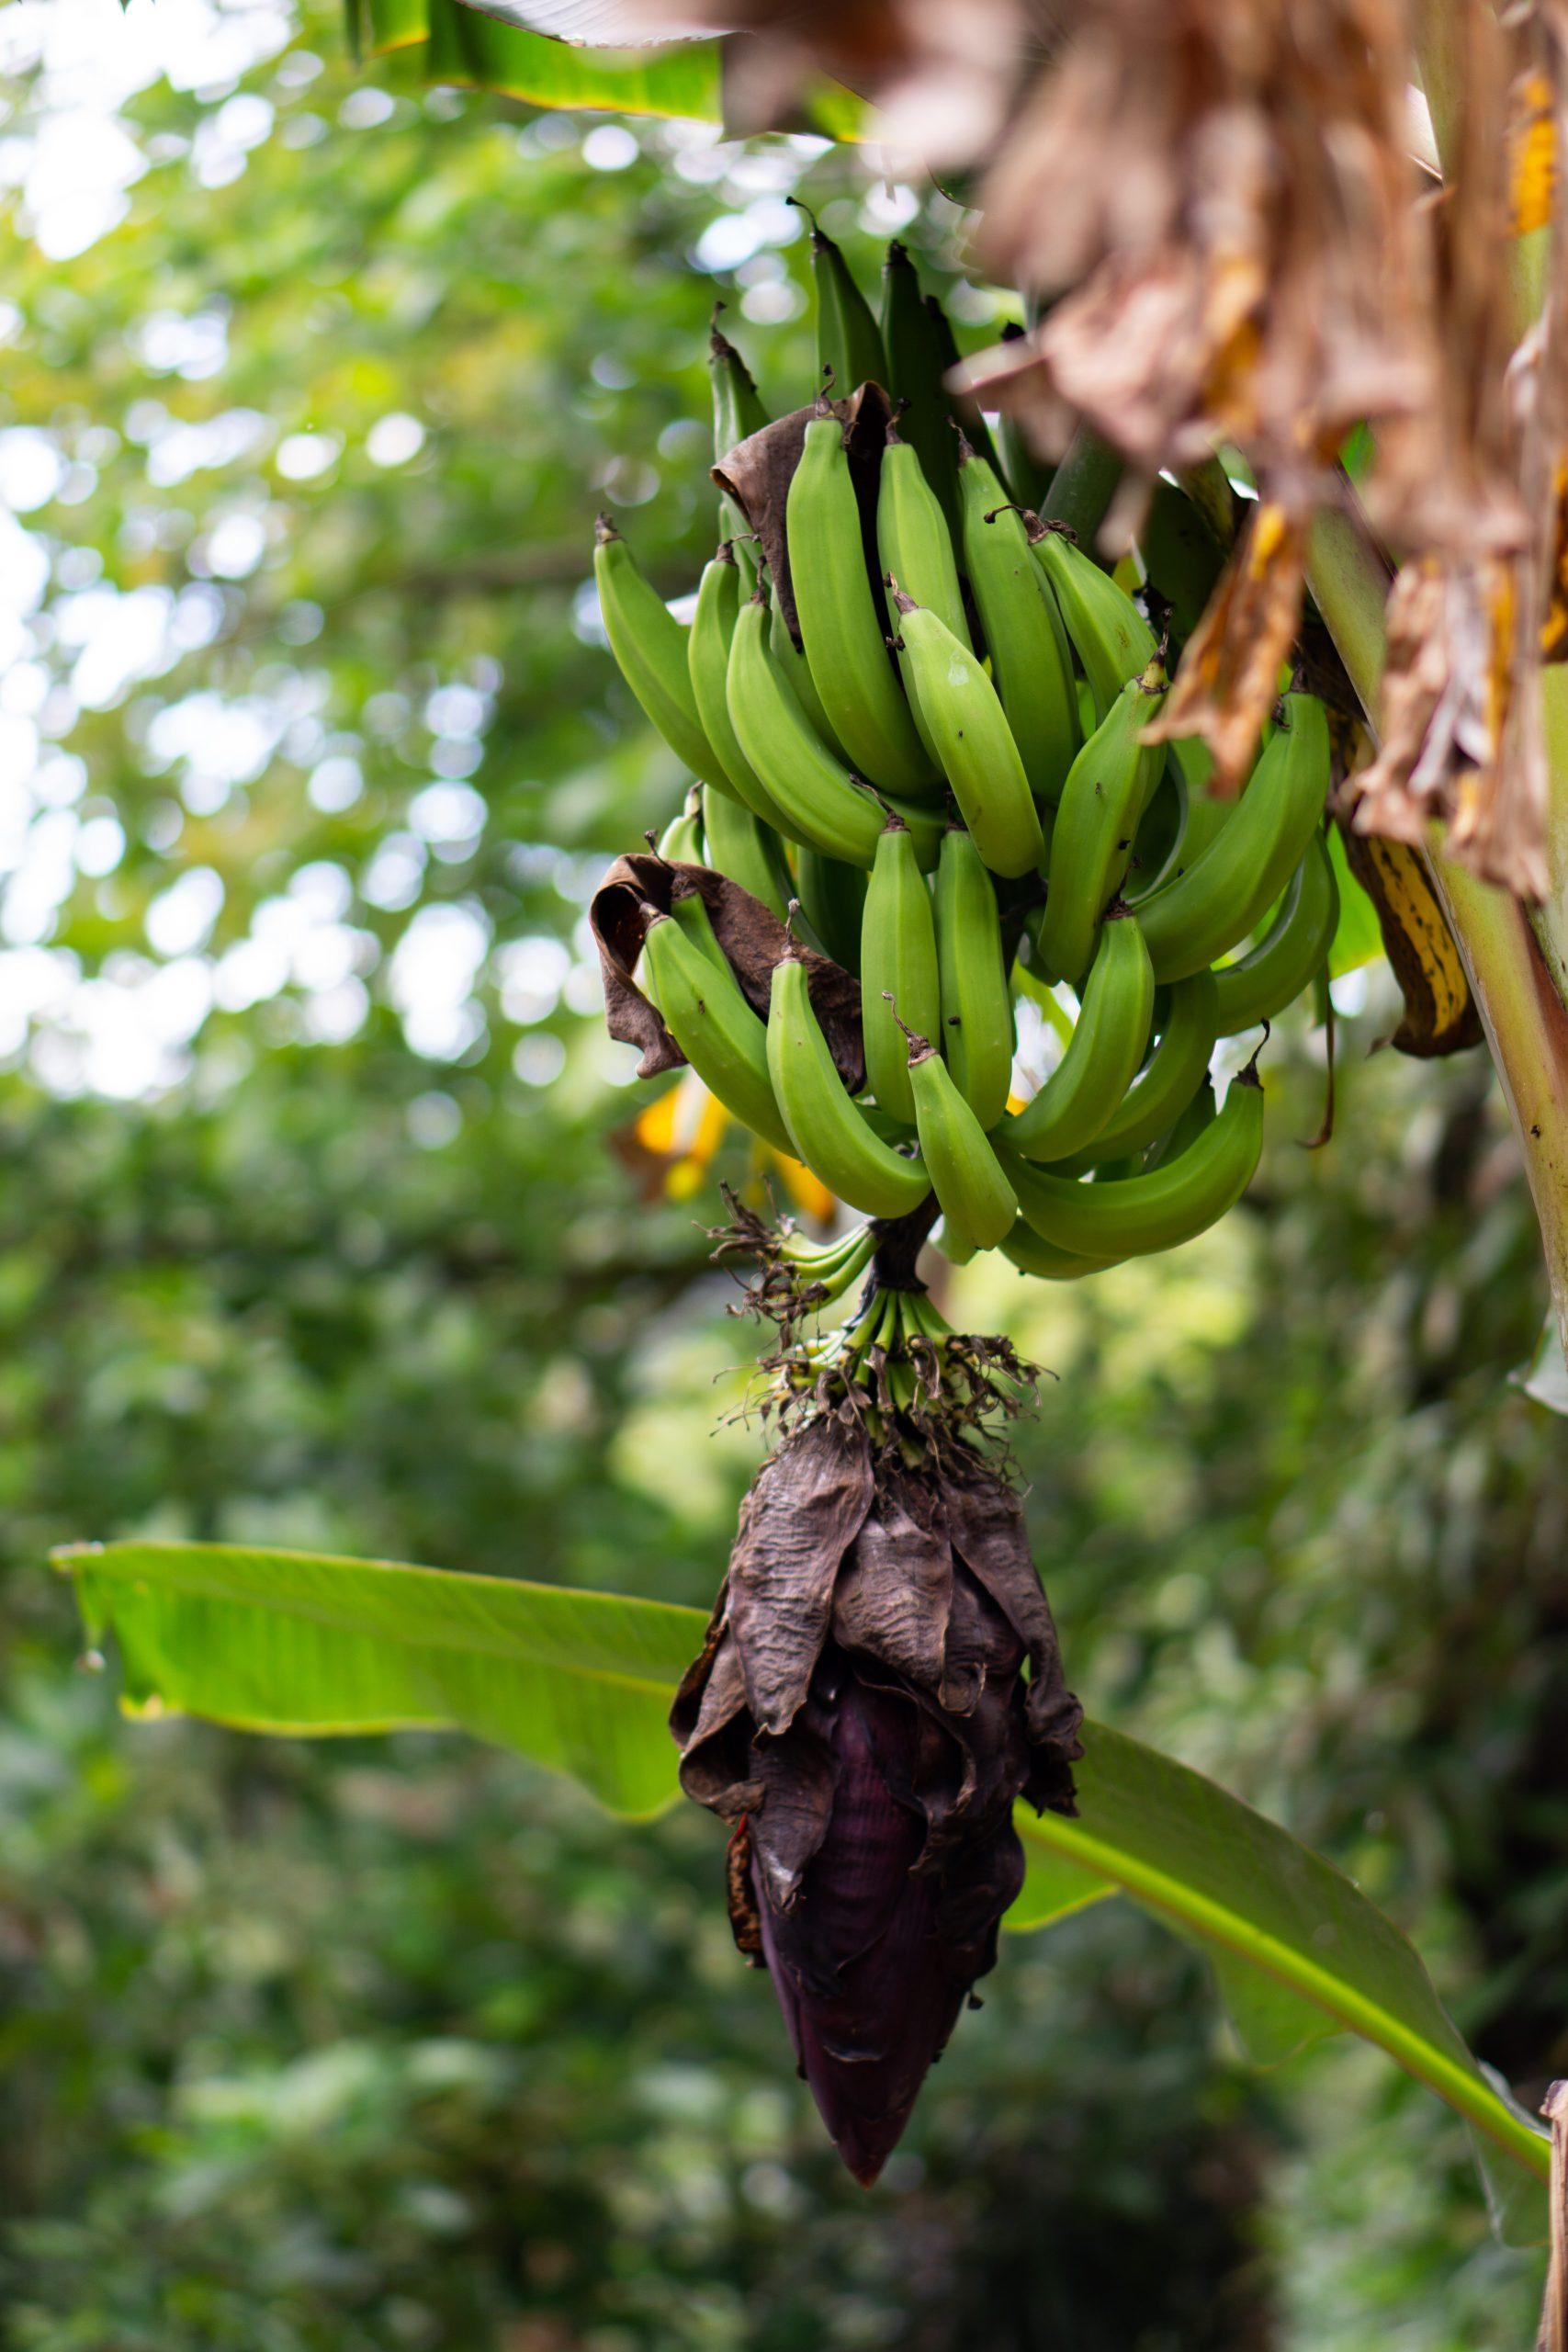 Fresh bunch of bananas